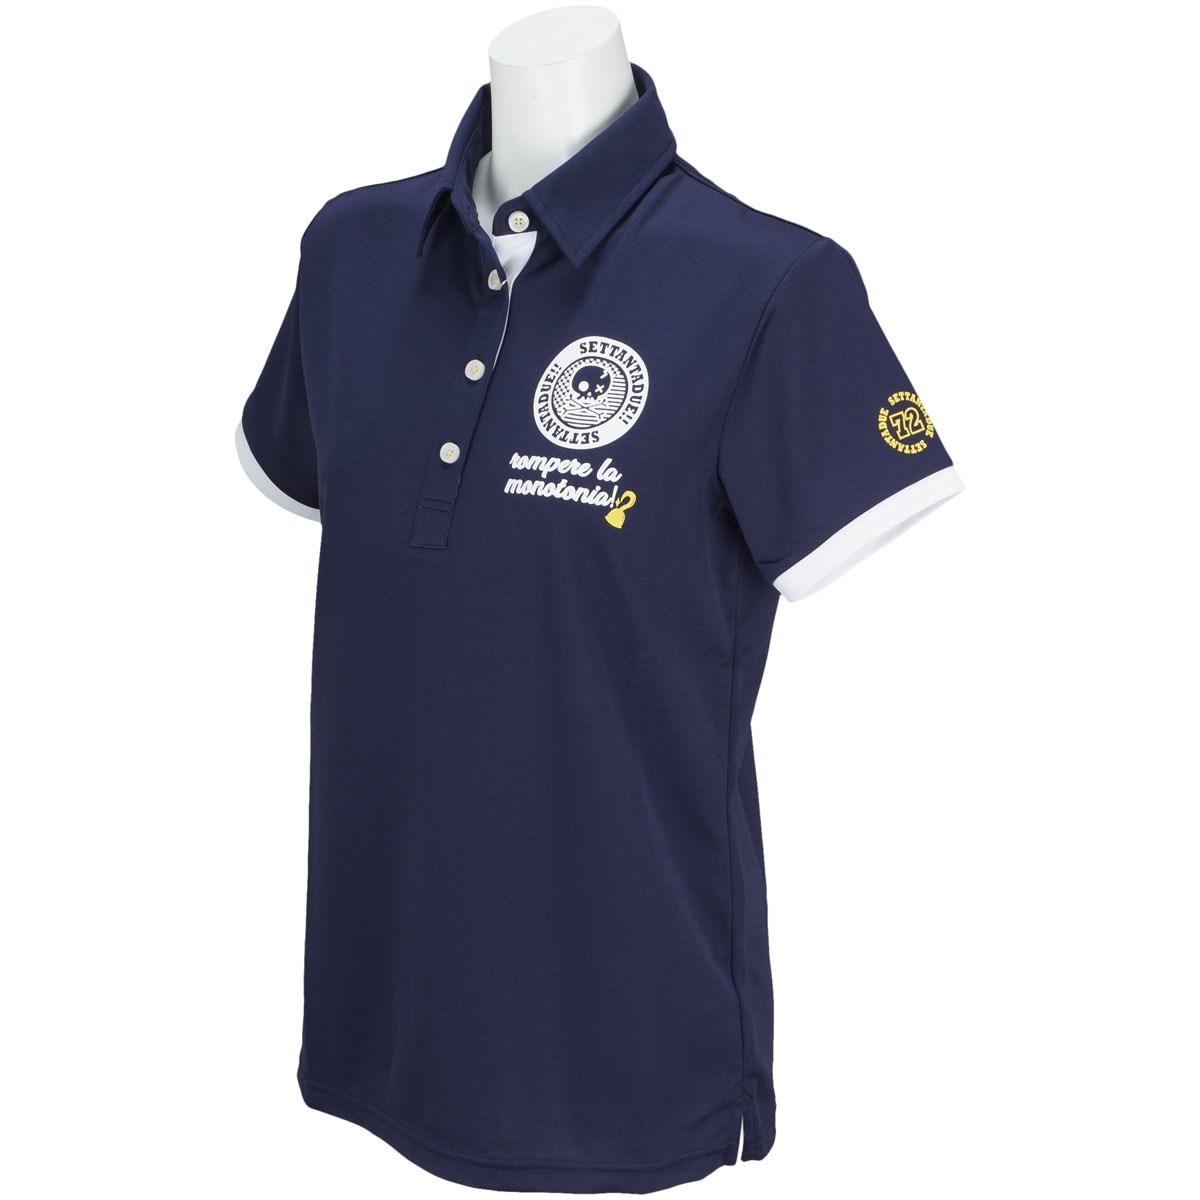 PAR72 パー72 半袖ポロシャツ M ネイビー レディス